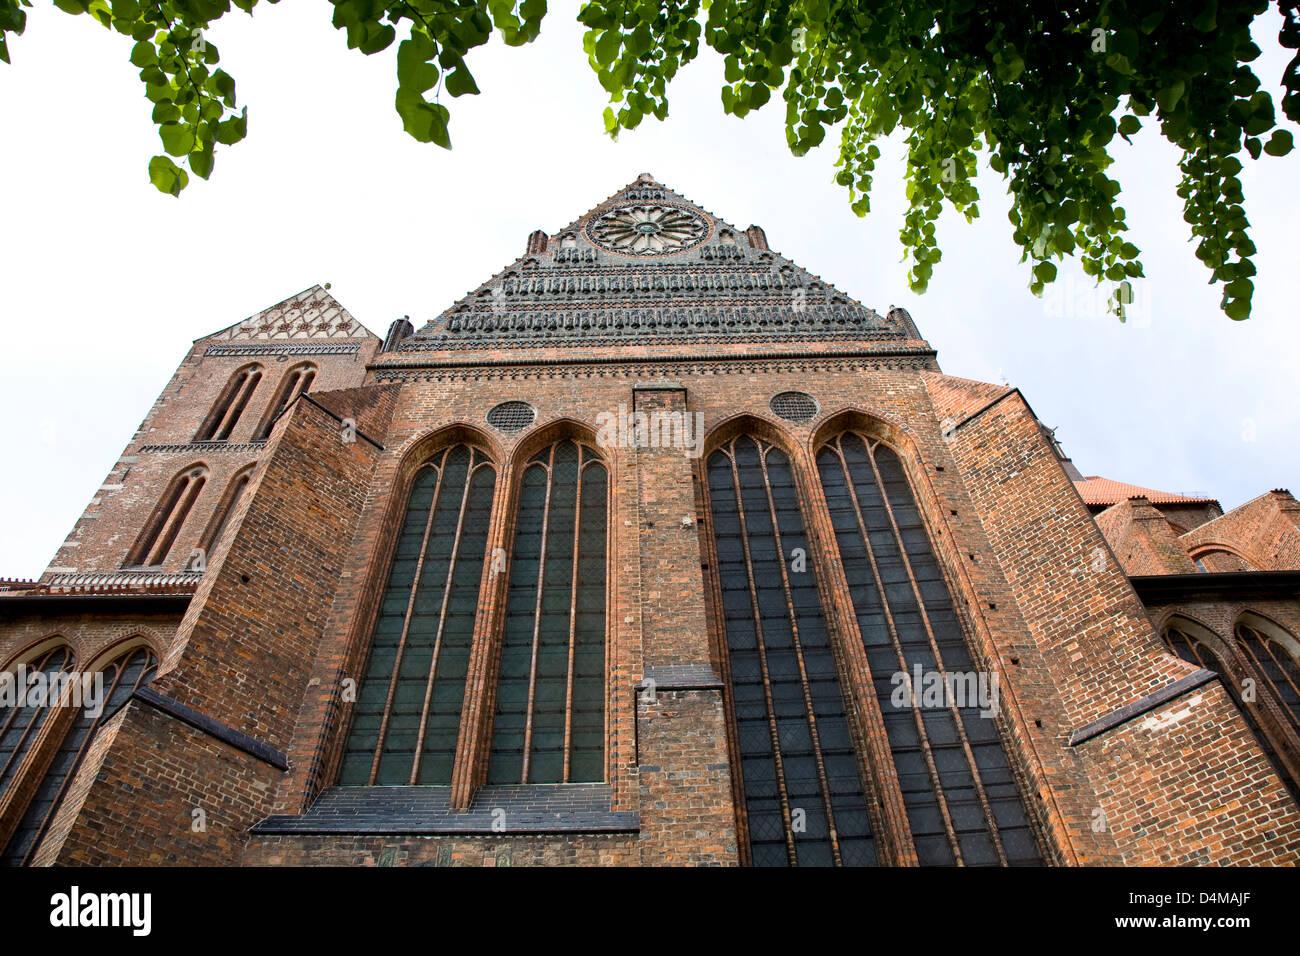 Wismar, Germany facade of St. Nicholas Church - Stock Image